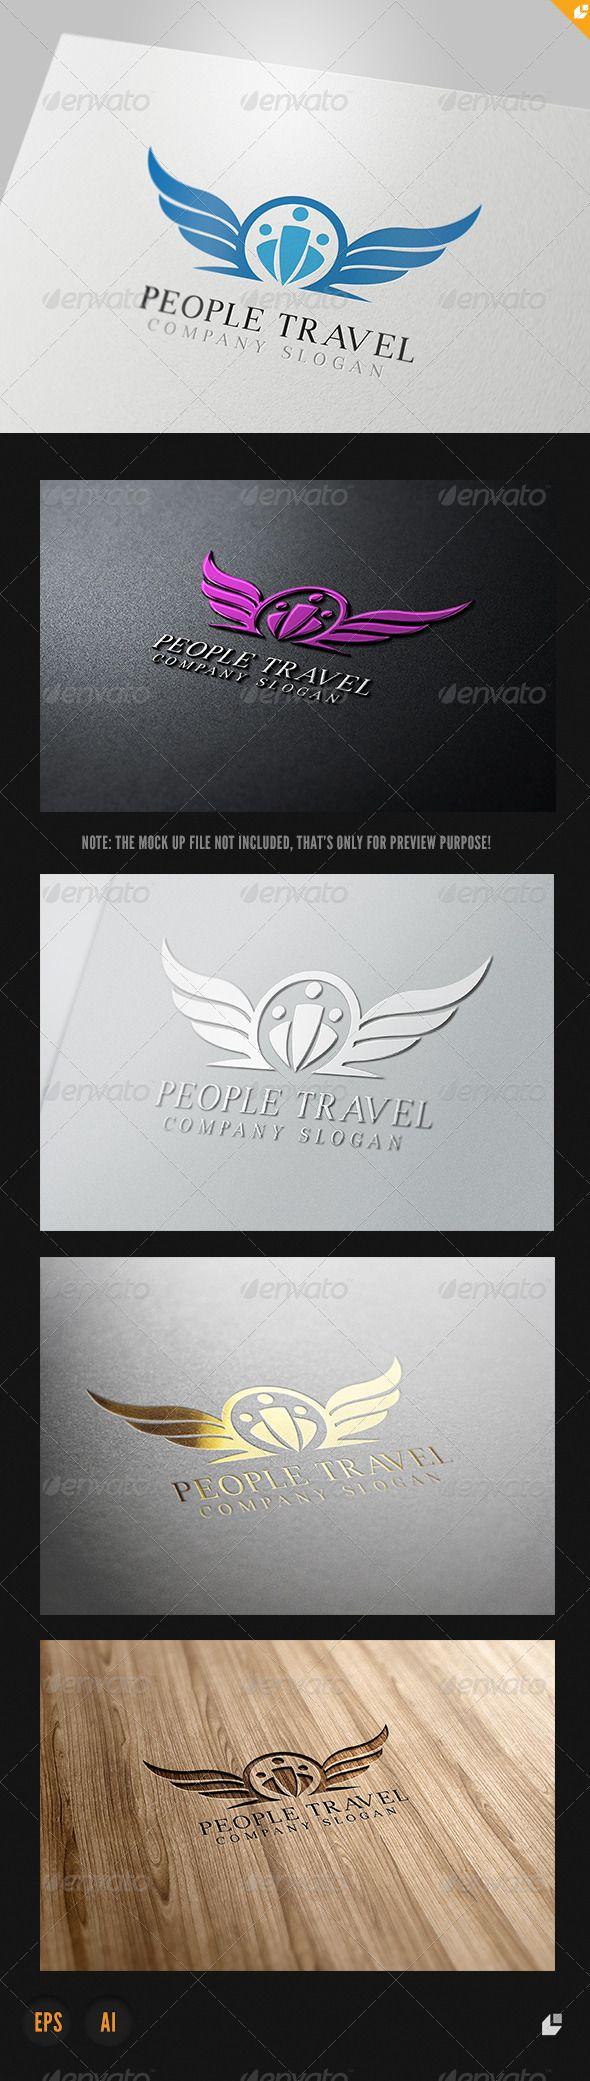 People Travel Logo Design Template Vector #logotype Download it here: http://graphicriver.net/item/people-travel-logo/4053131?s_rank=393?ref=nesto